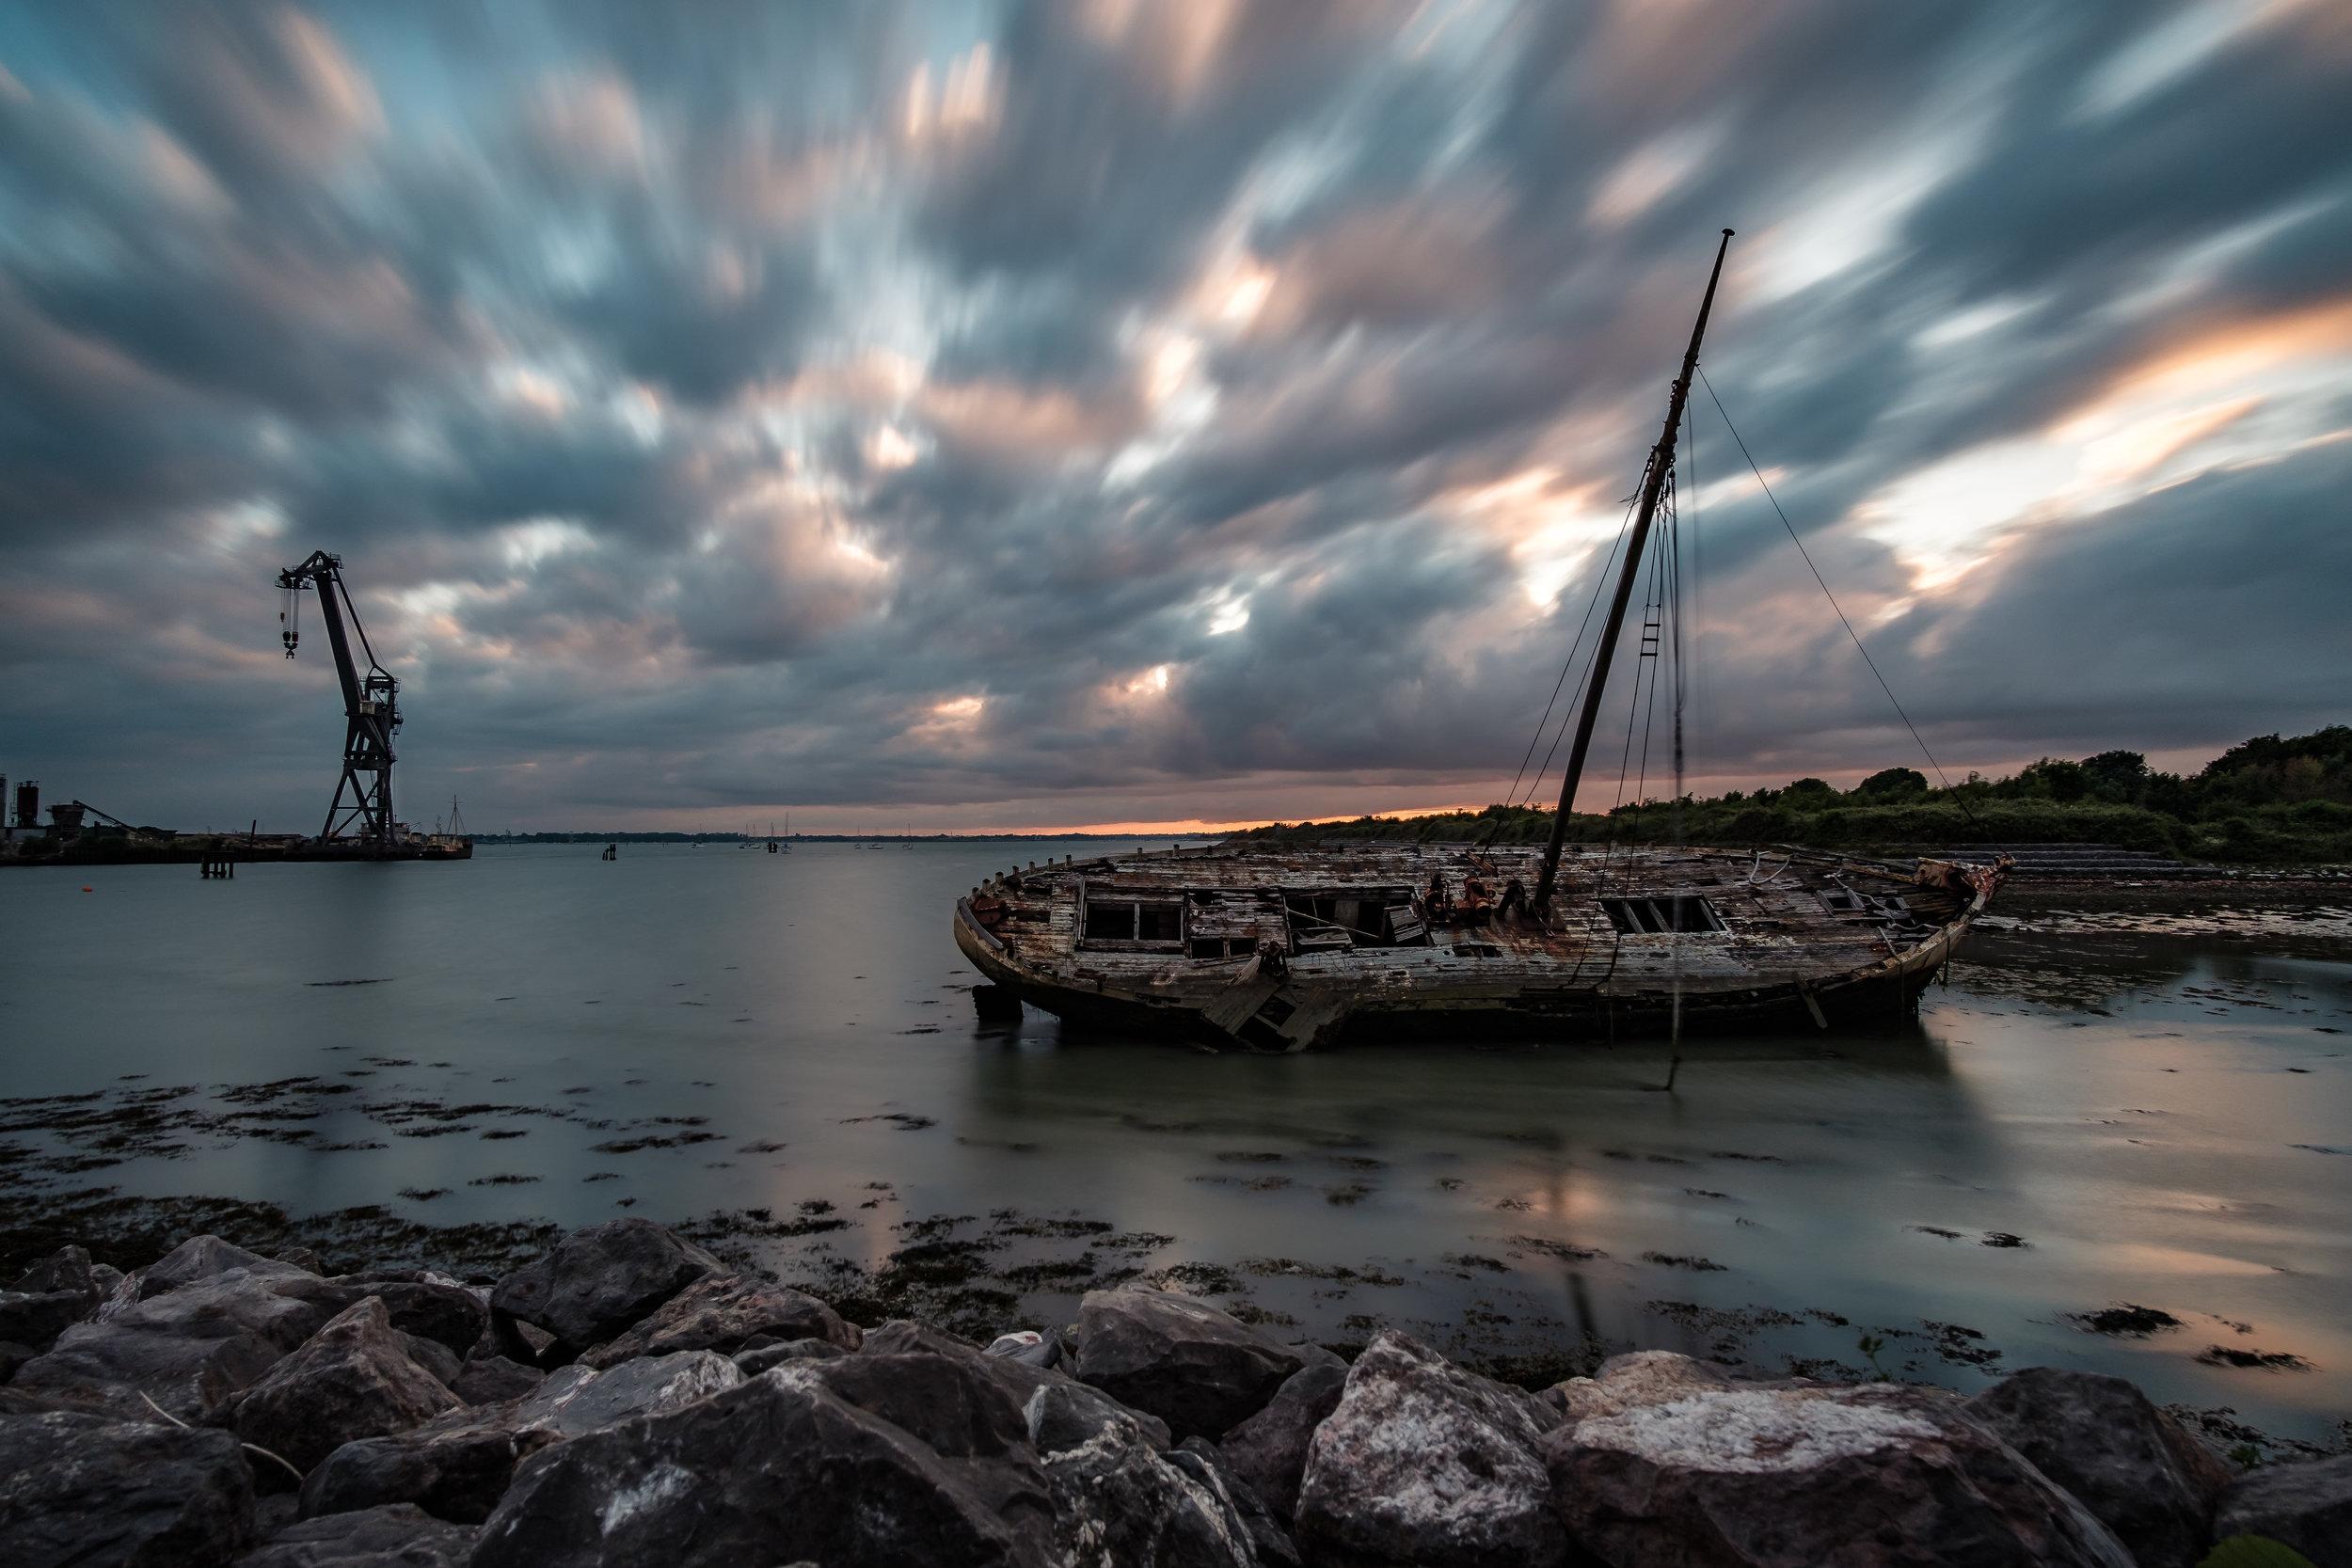 Tipner Ship Wreck - Portsmouth, UK